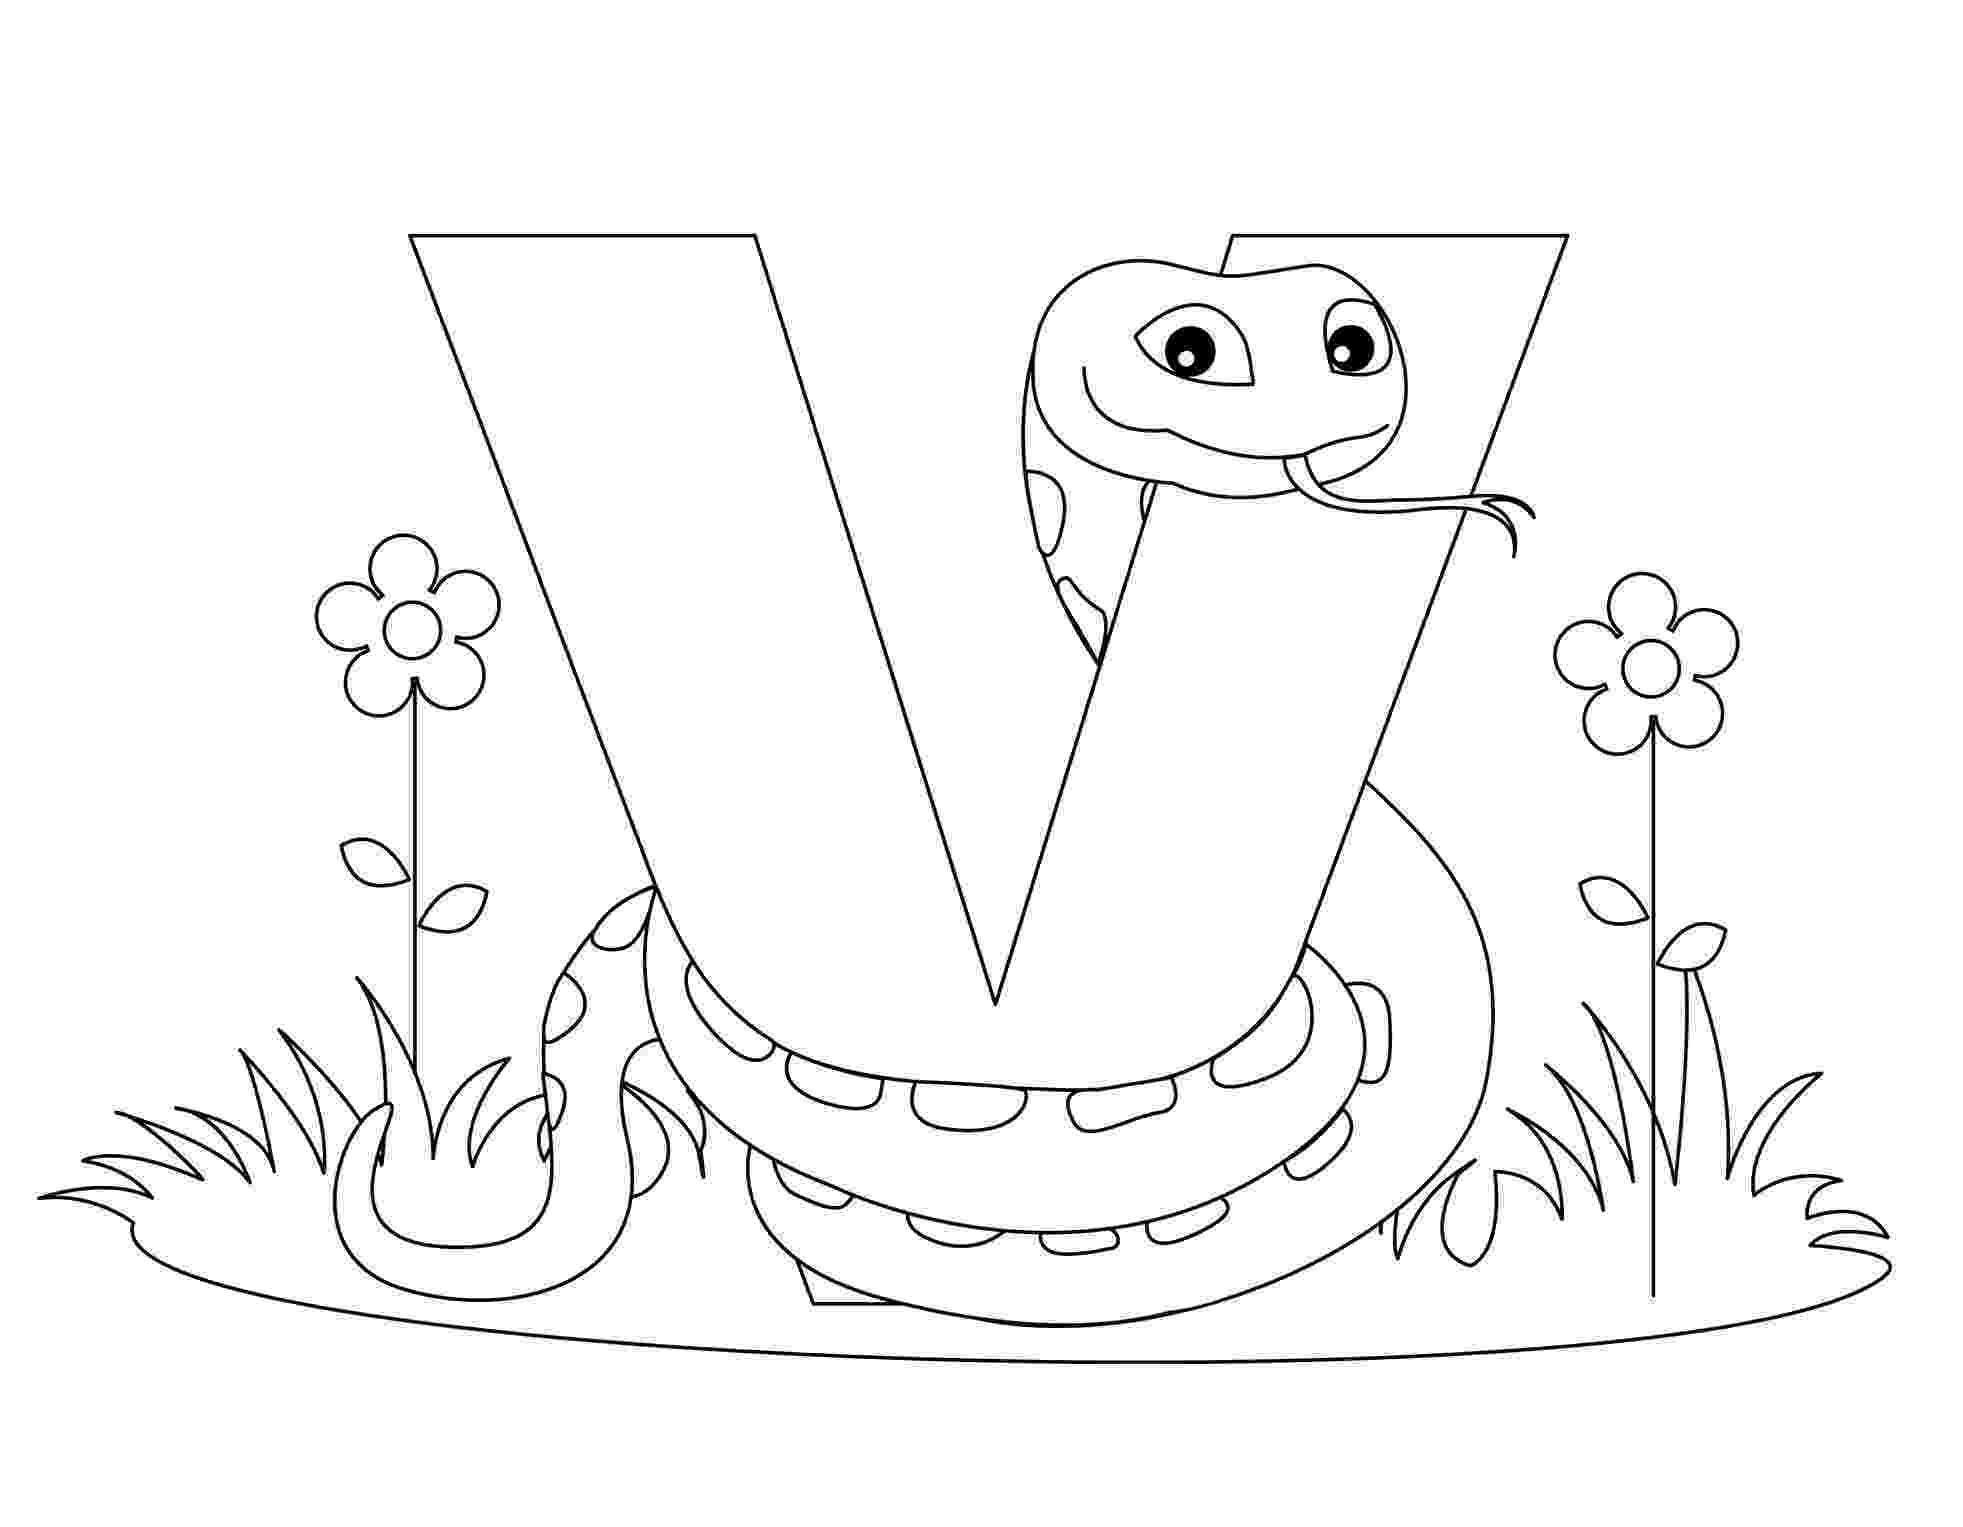 abc coloring sheets free printable alphabet coloring pages for kids best abc coloring sheets 1 3